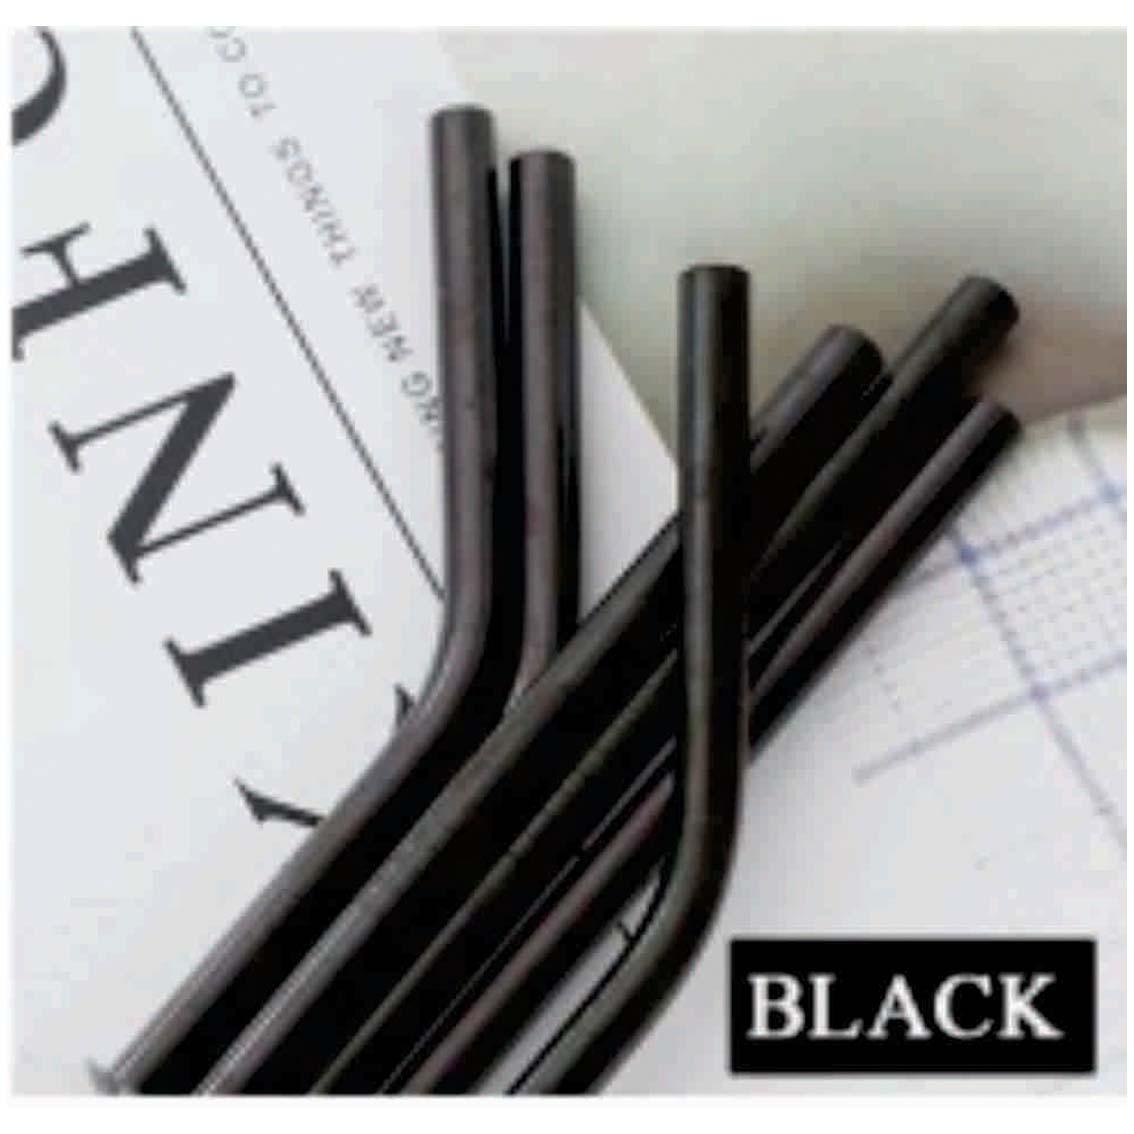 Steel Straw Set Minimum 20 Units Promo Plus